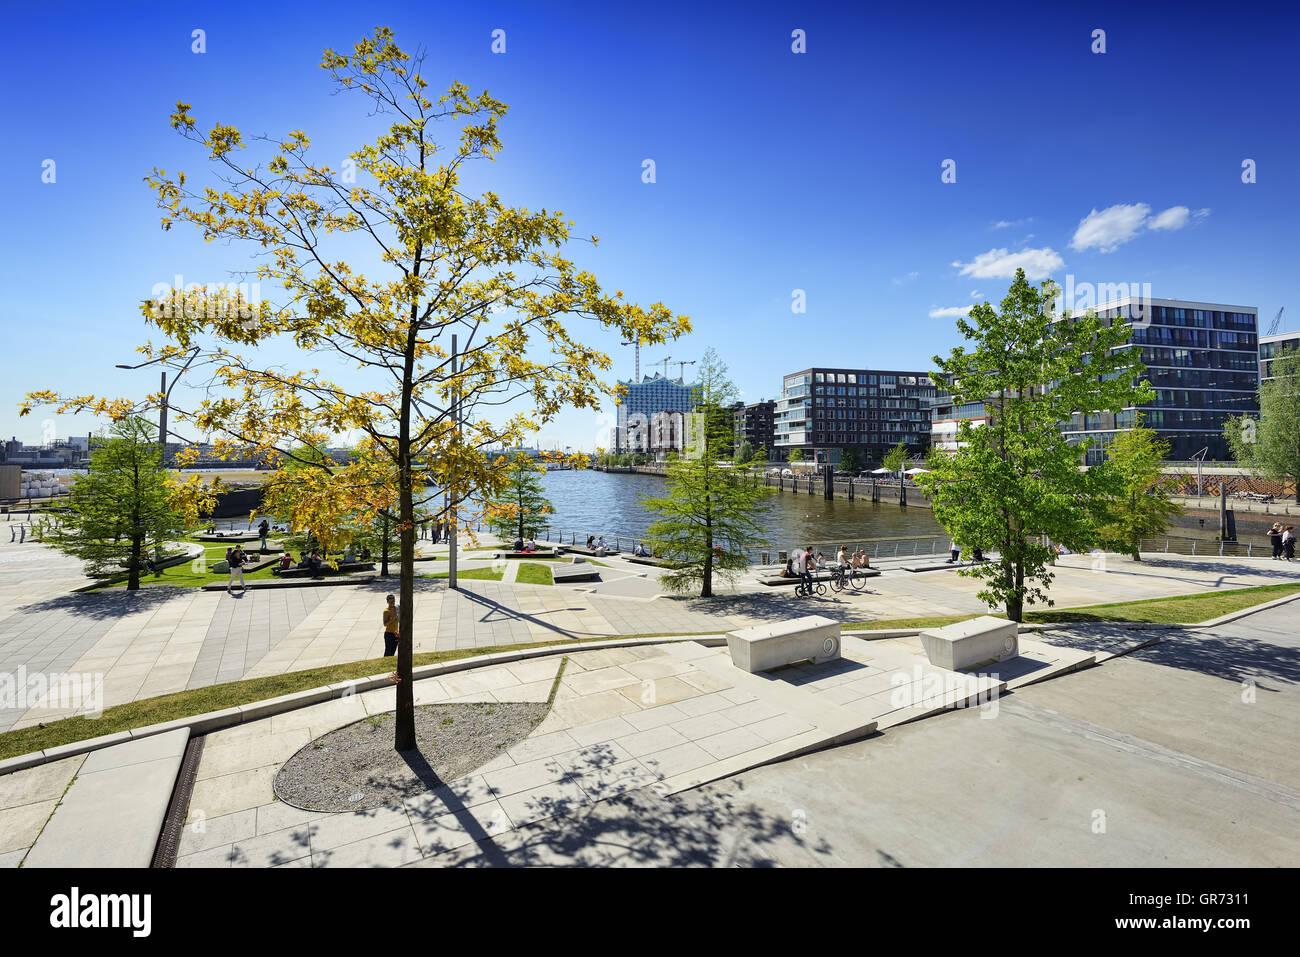 Marco Polo Terraces In Hamburg, Germany - Stock Image